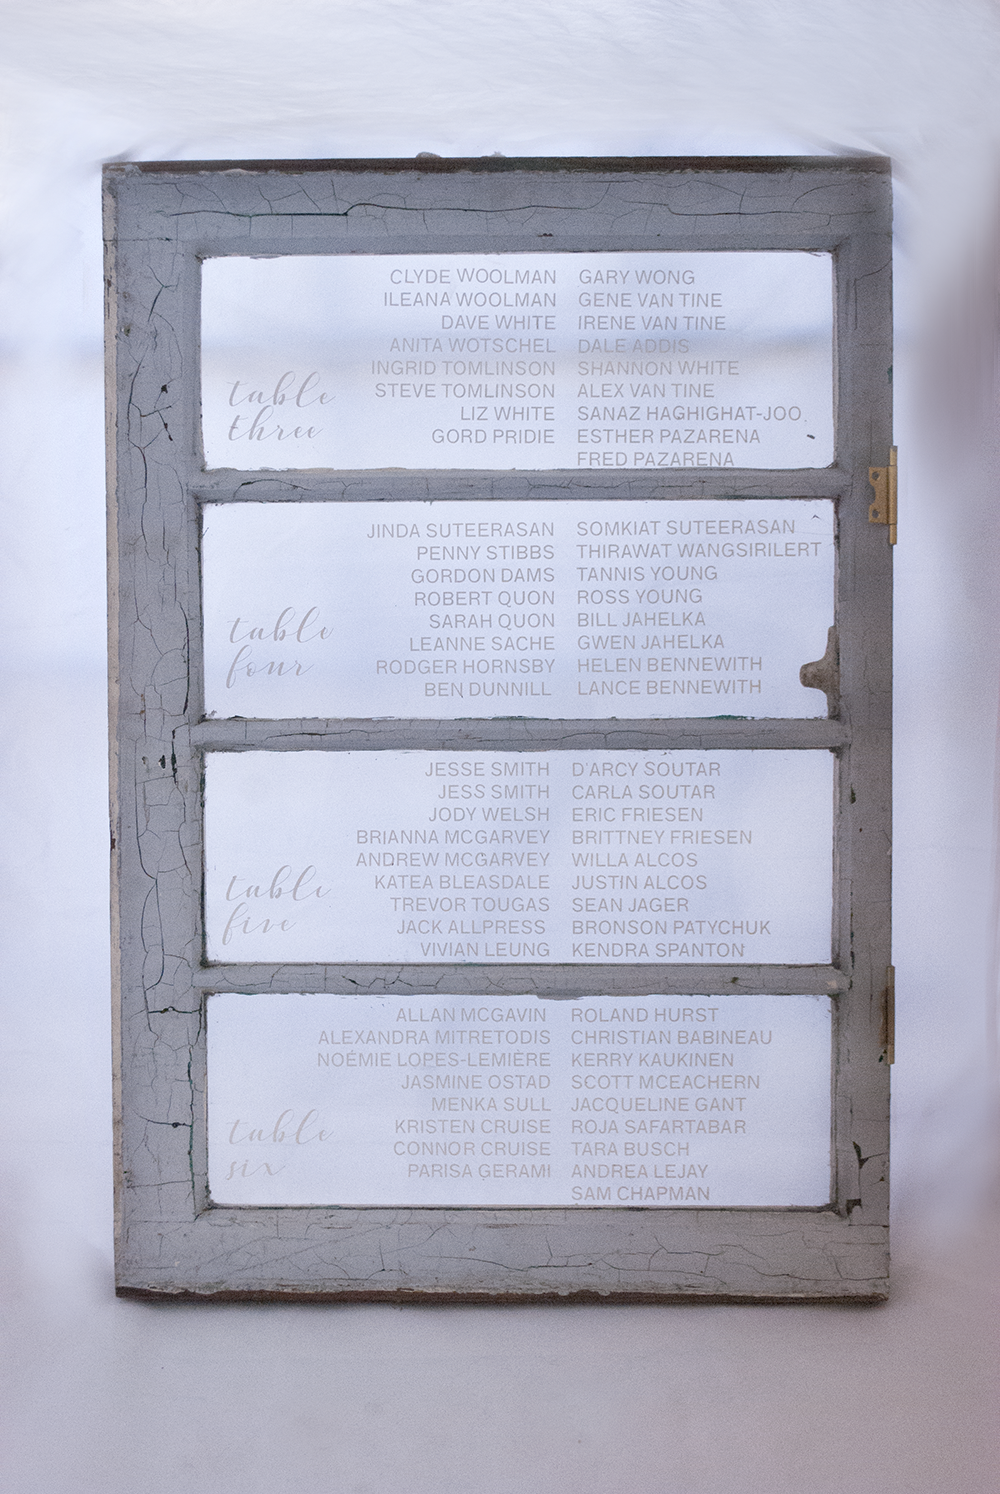 vintage window  Quantity: 4  Price: $35.00 ($175 including graphic)